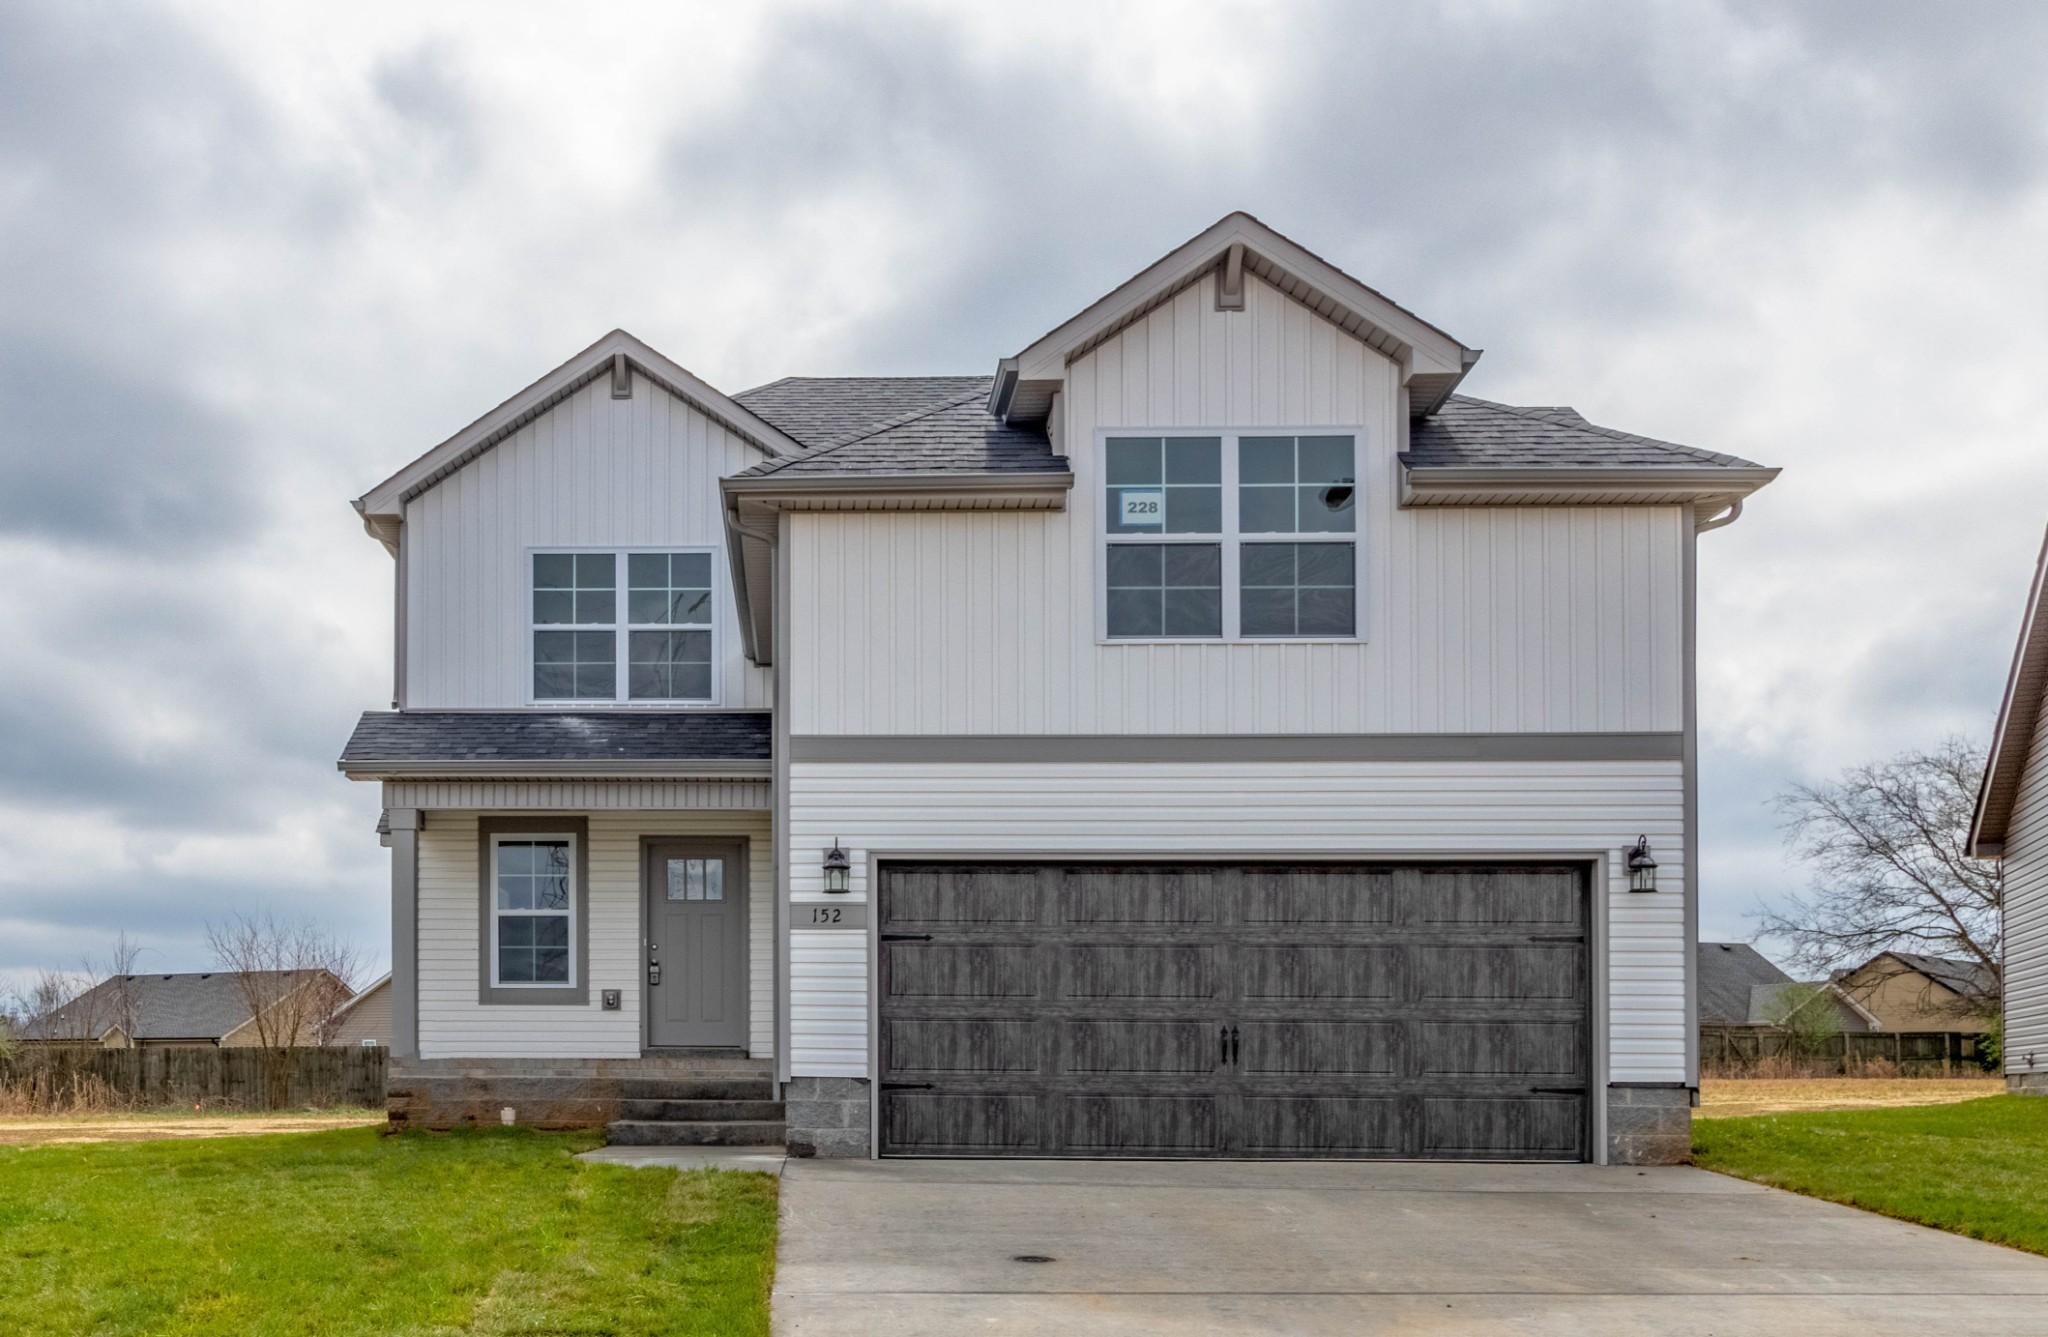 152 Sambar Dr, Clarksville, TN 37040 - Clarksville, TN real estate listing